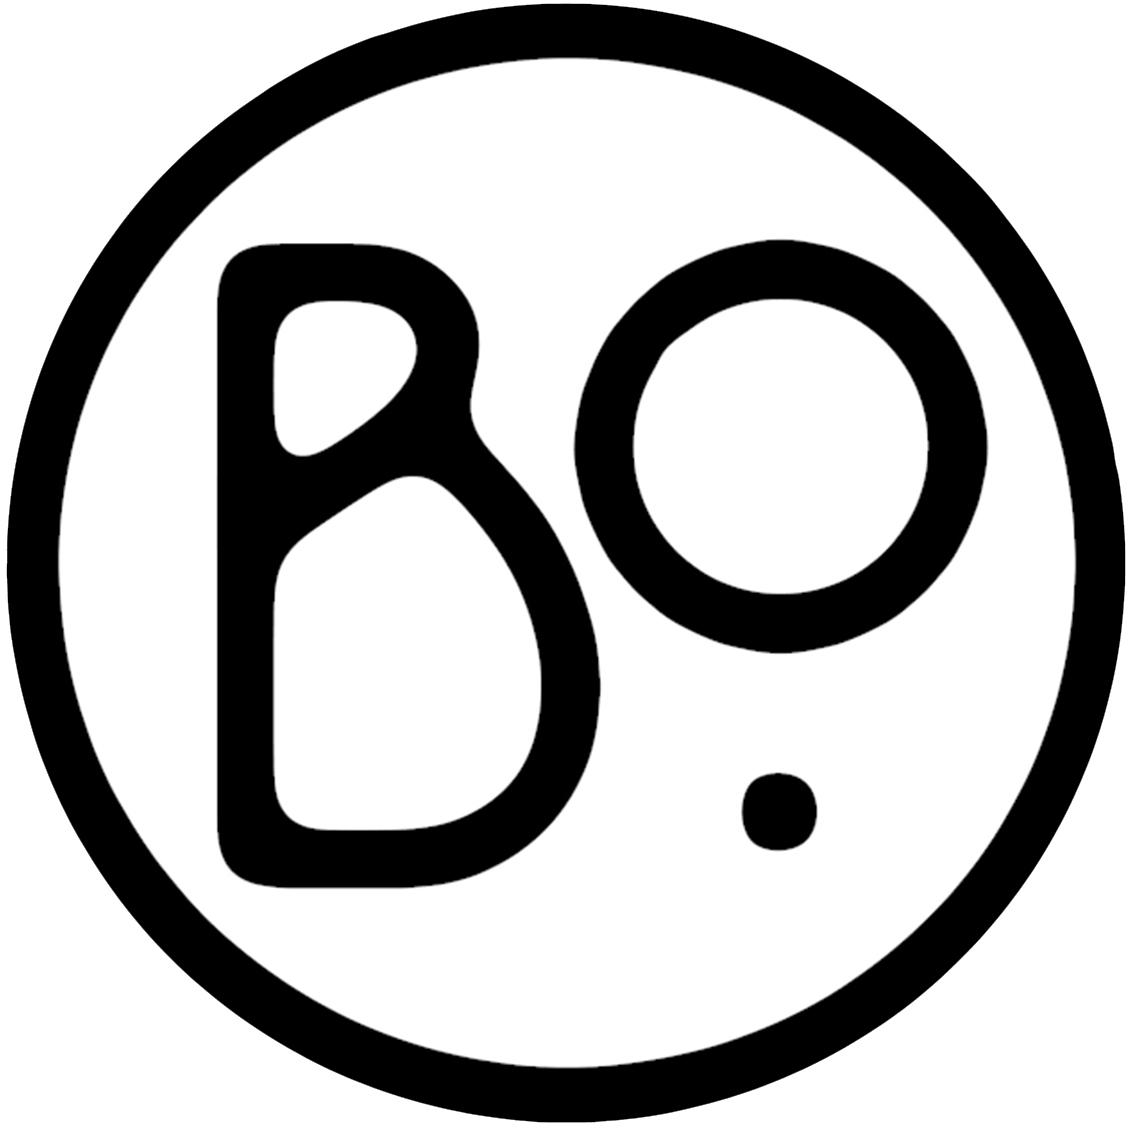 BOWMANVILLE ICON 02.jpg